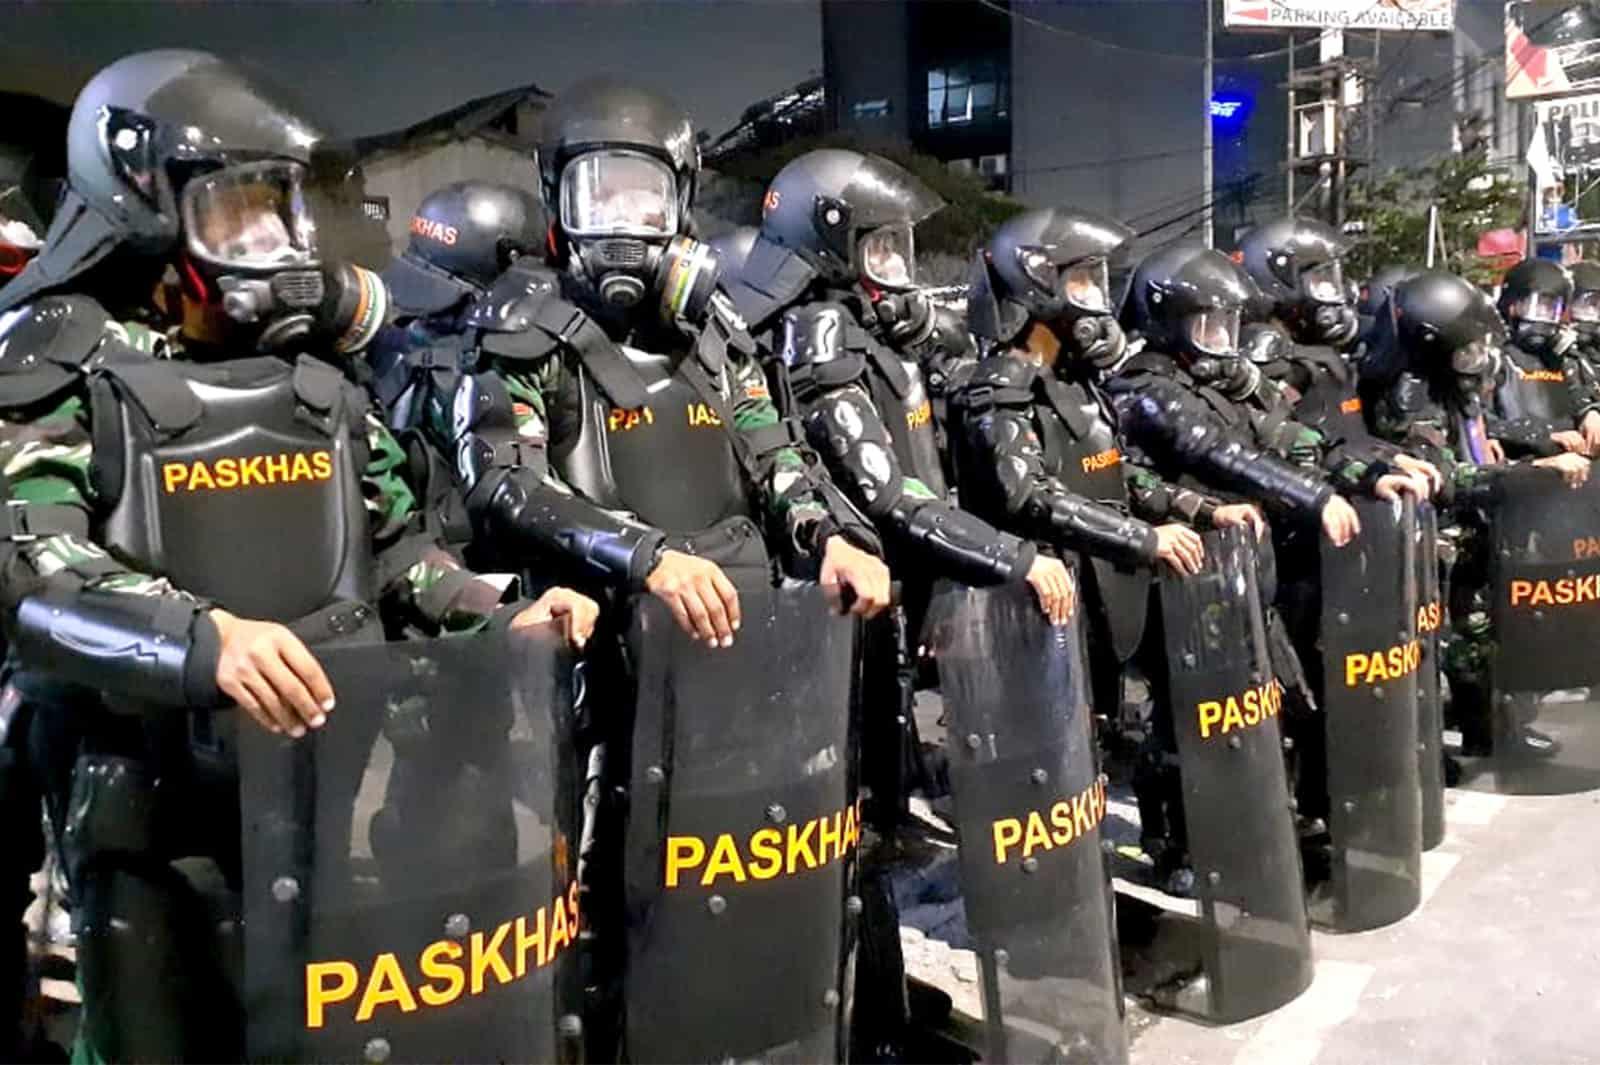 Yonko 462 Paskhas Amankan Polsek Tanah Abang Dari Aksi Demo Anarkis